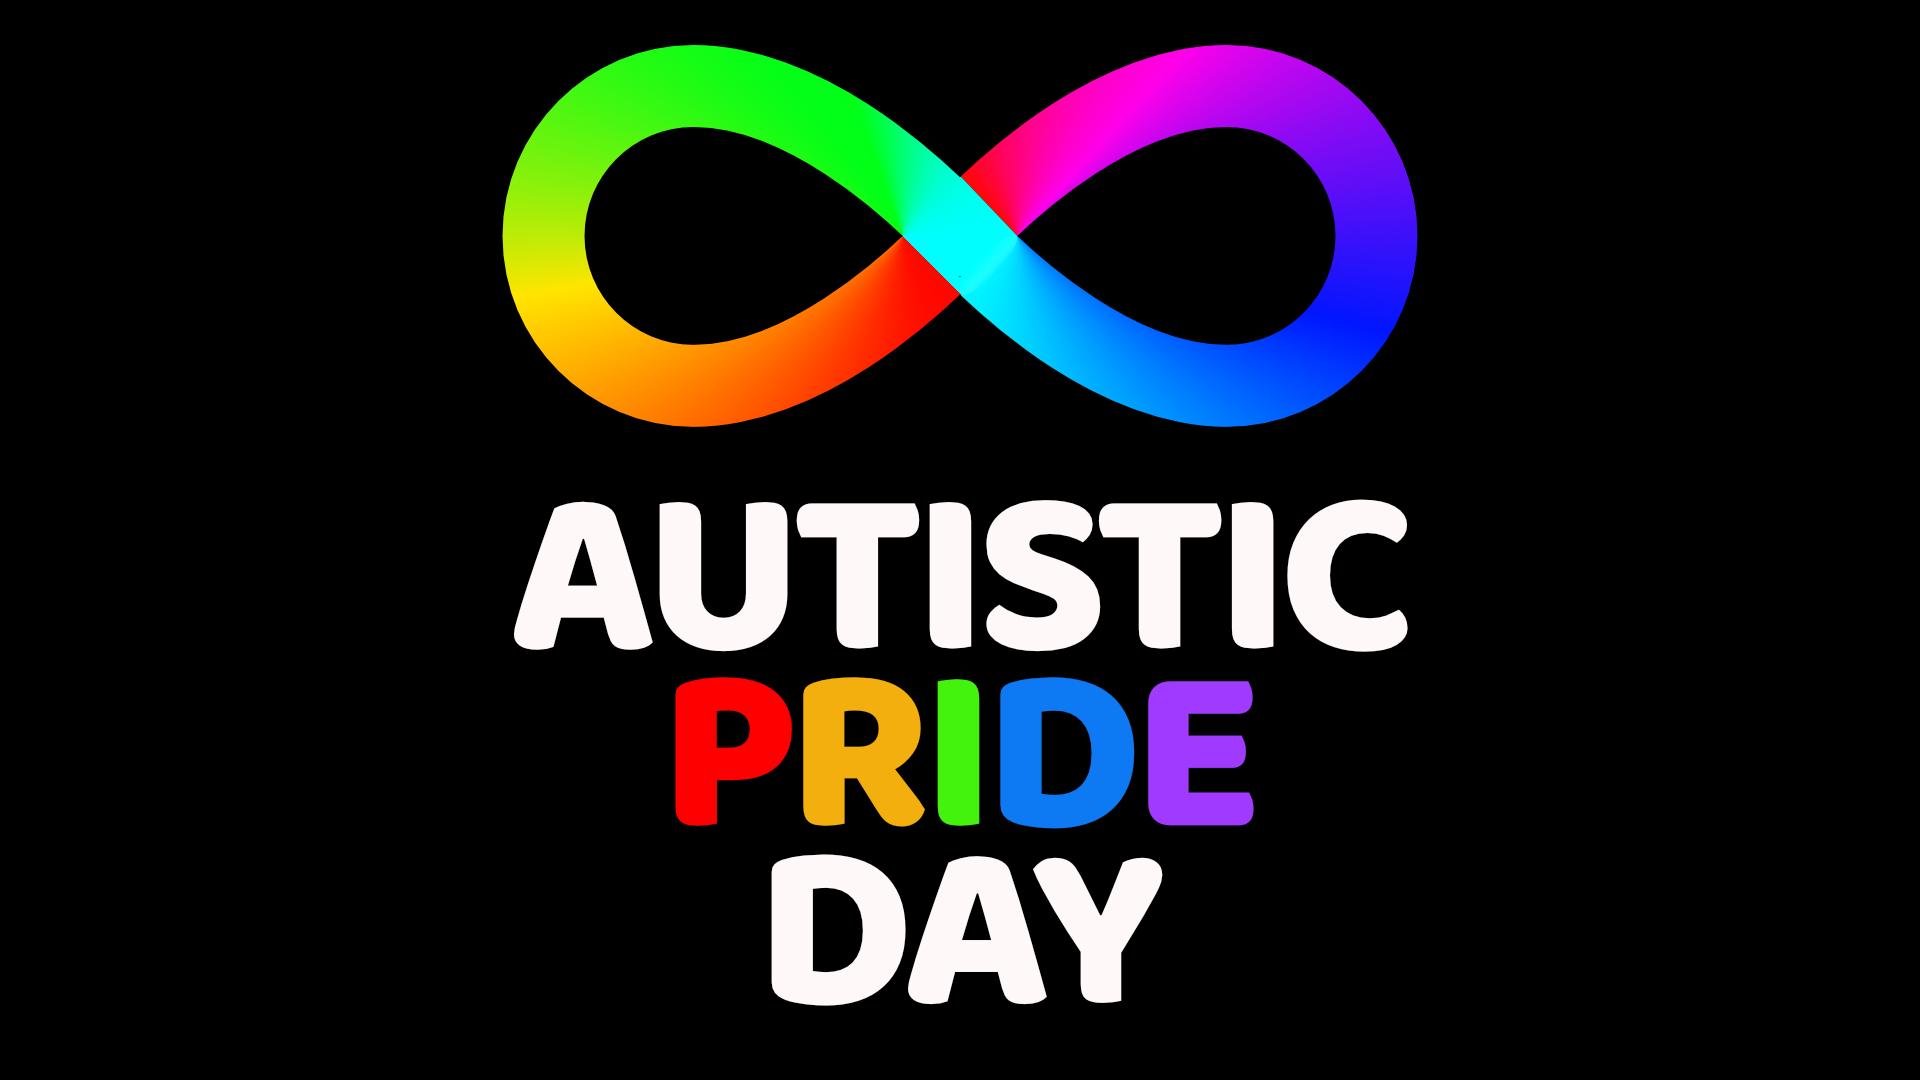 Autistic Pride Day: 18 June | ஆட்டிஸ்டிக் பெருமை நாள்: 18 ஜூன் |_40.1